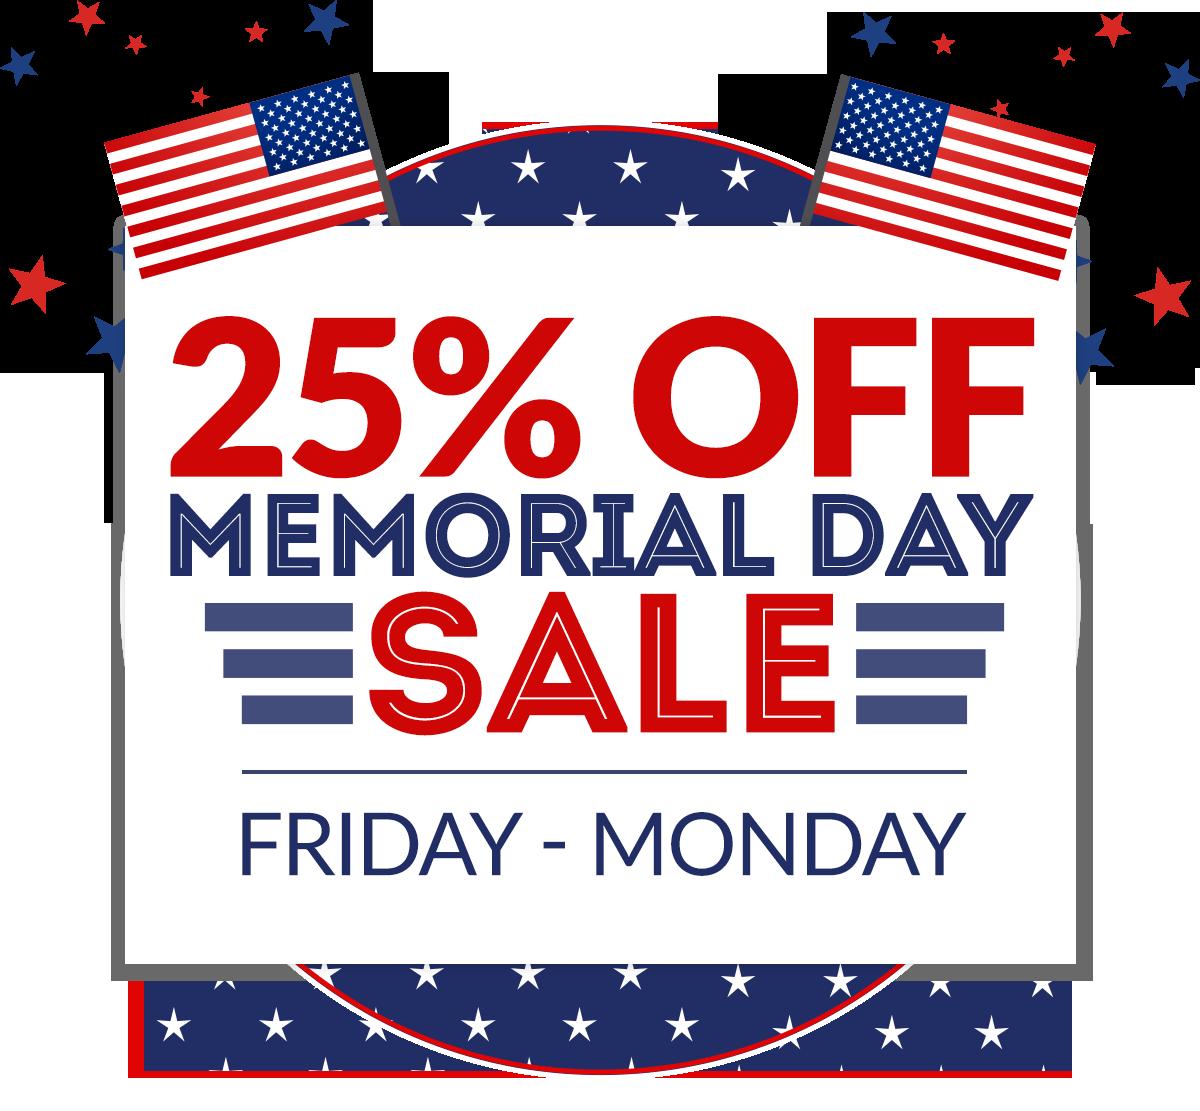 Memorial Day - 25% OFF